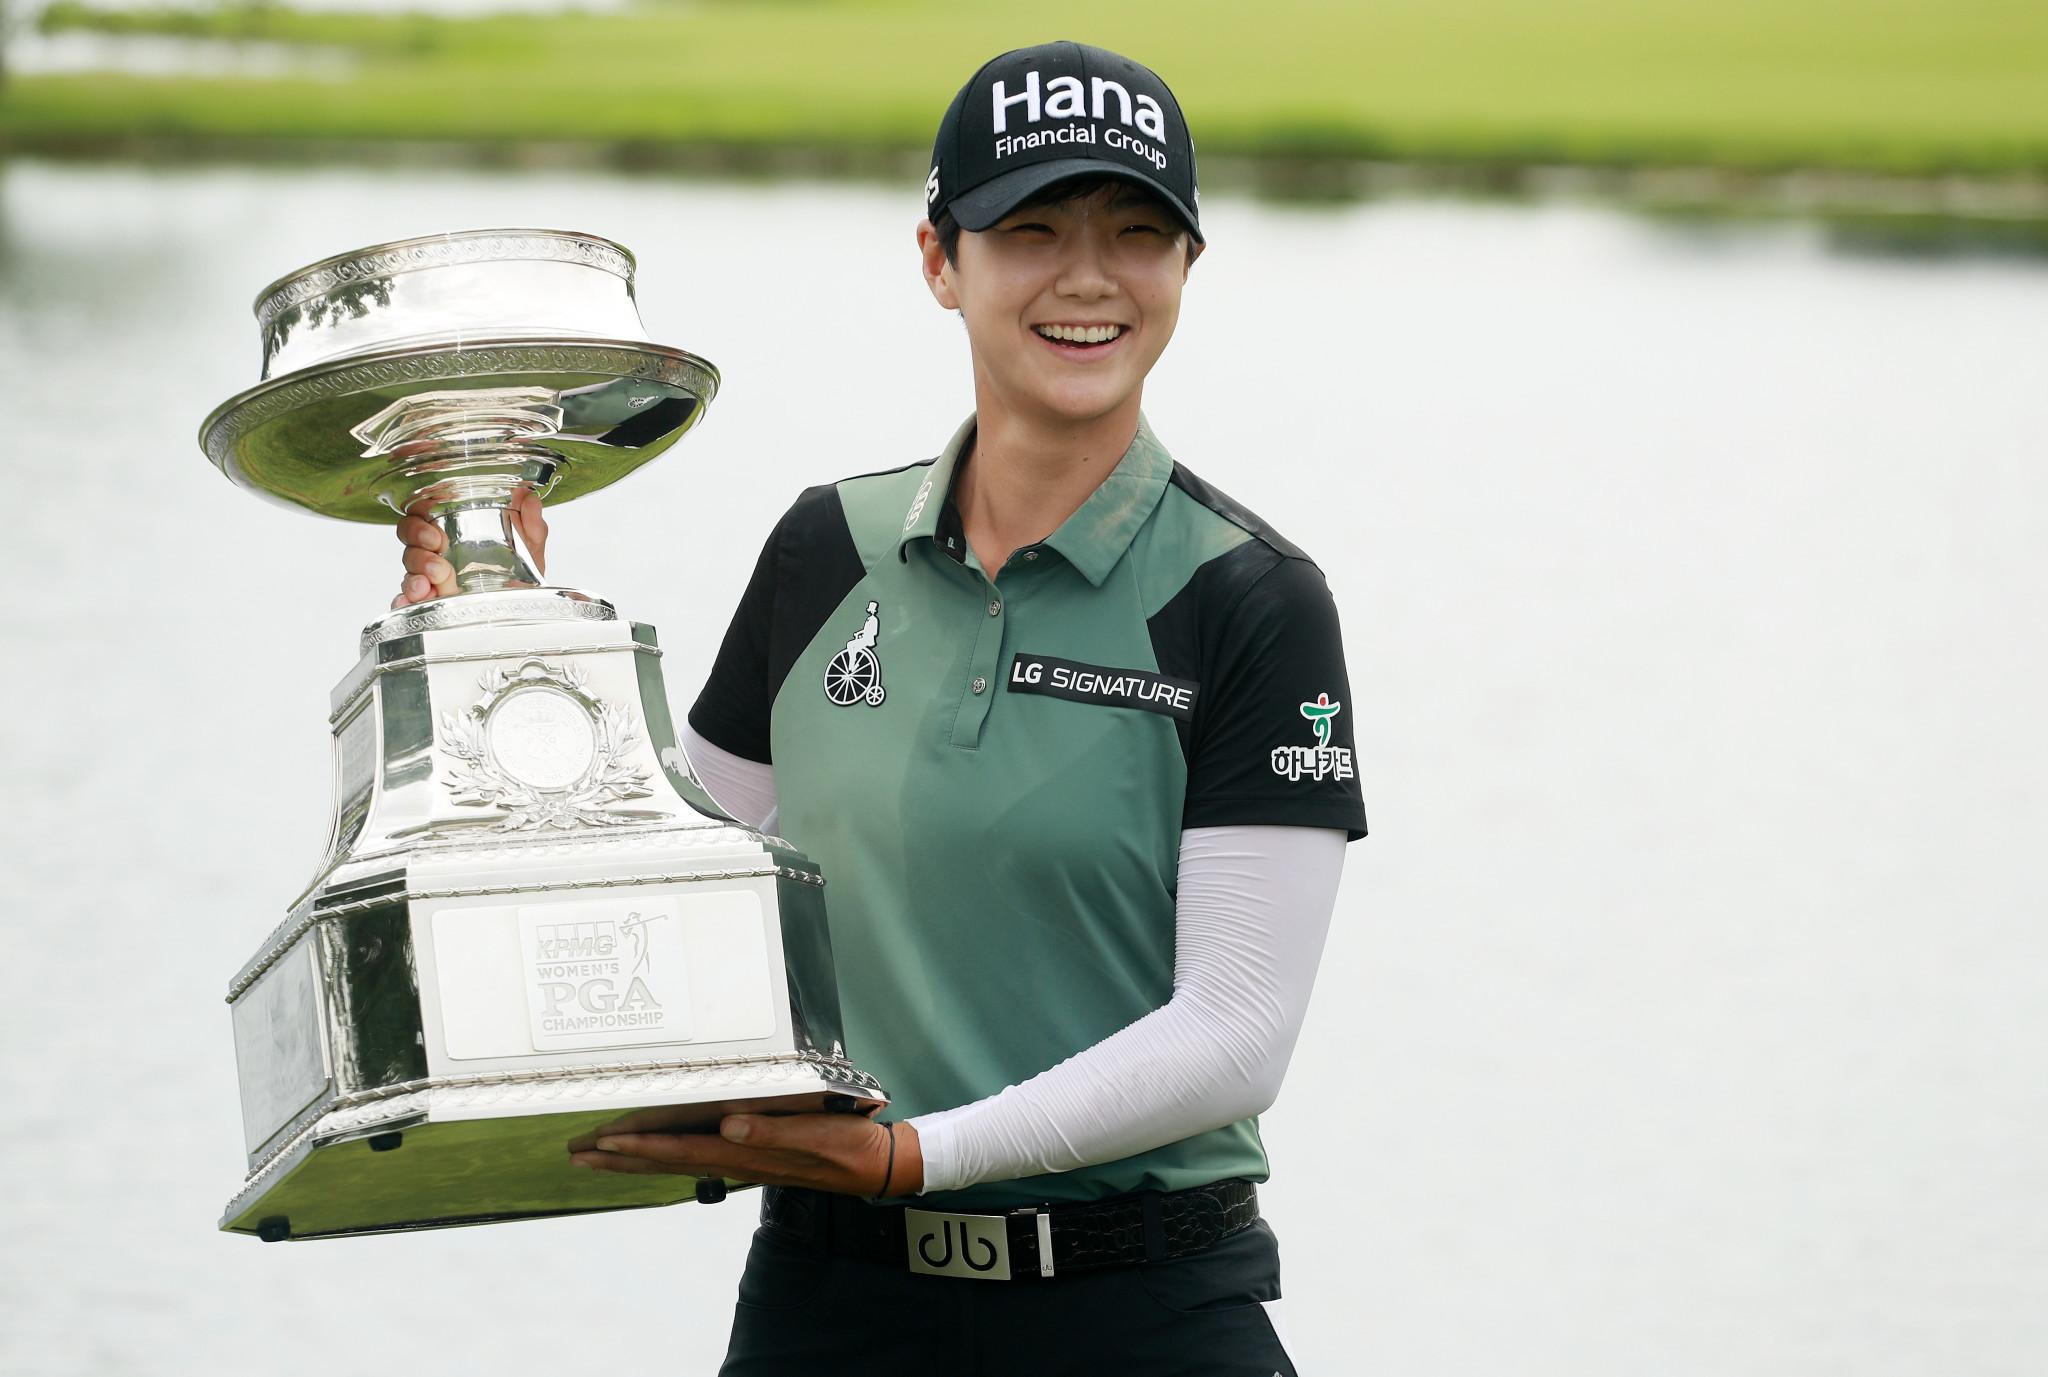 Sung Hyun Park takes KPMG Women's PGA title after three-way playoff at Kemper Lakes